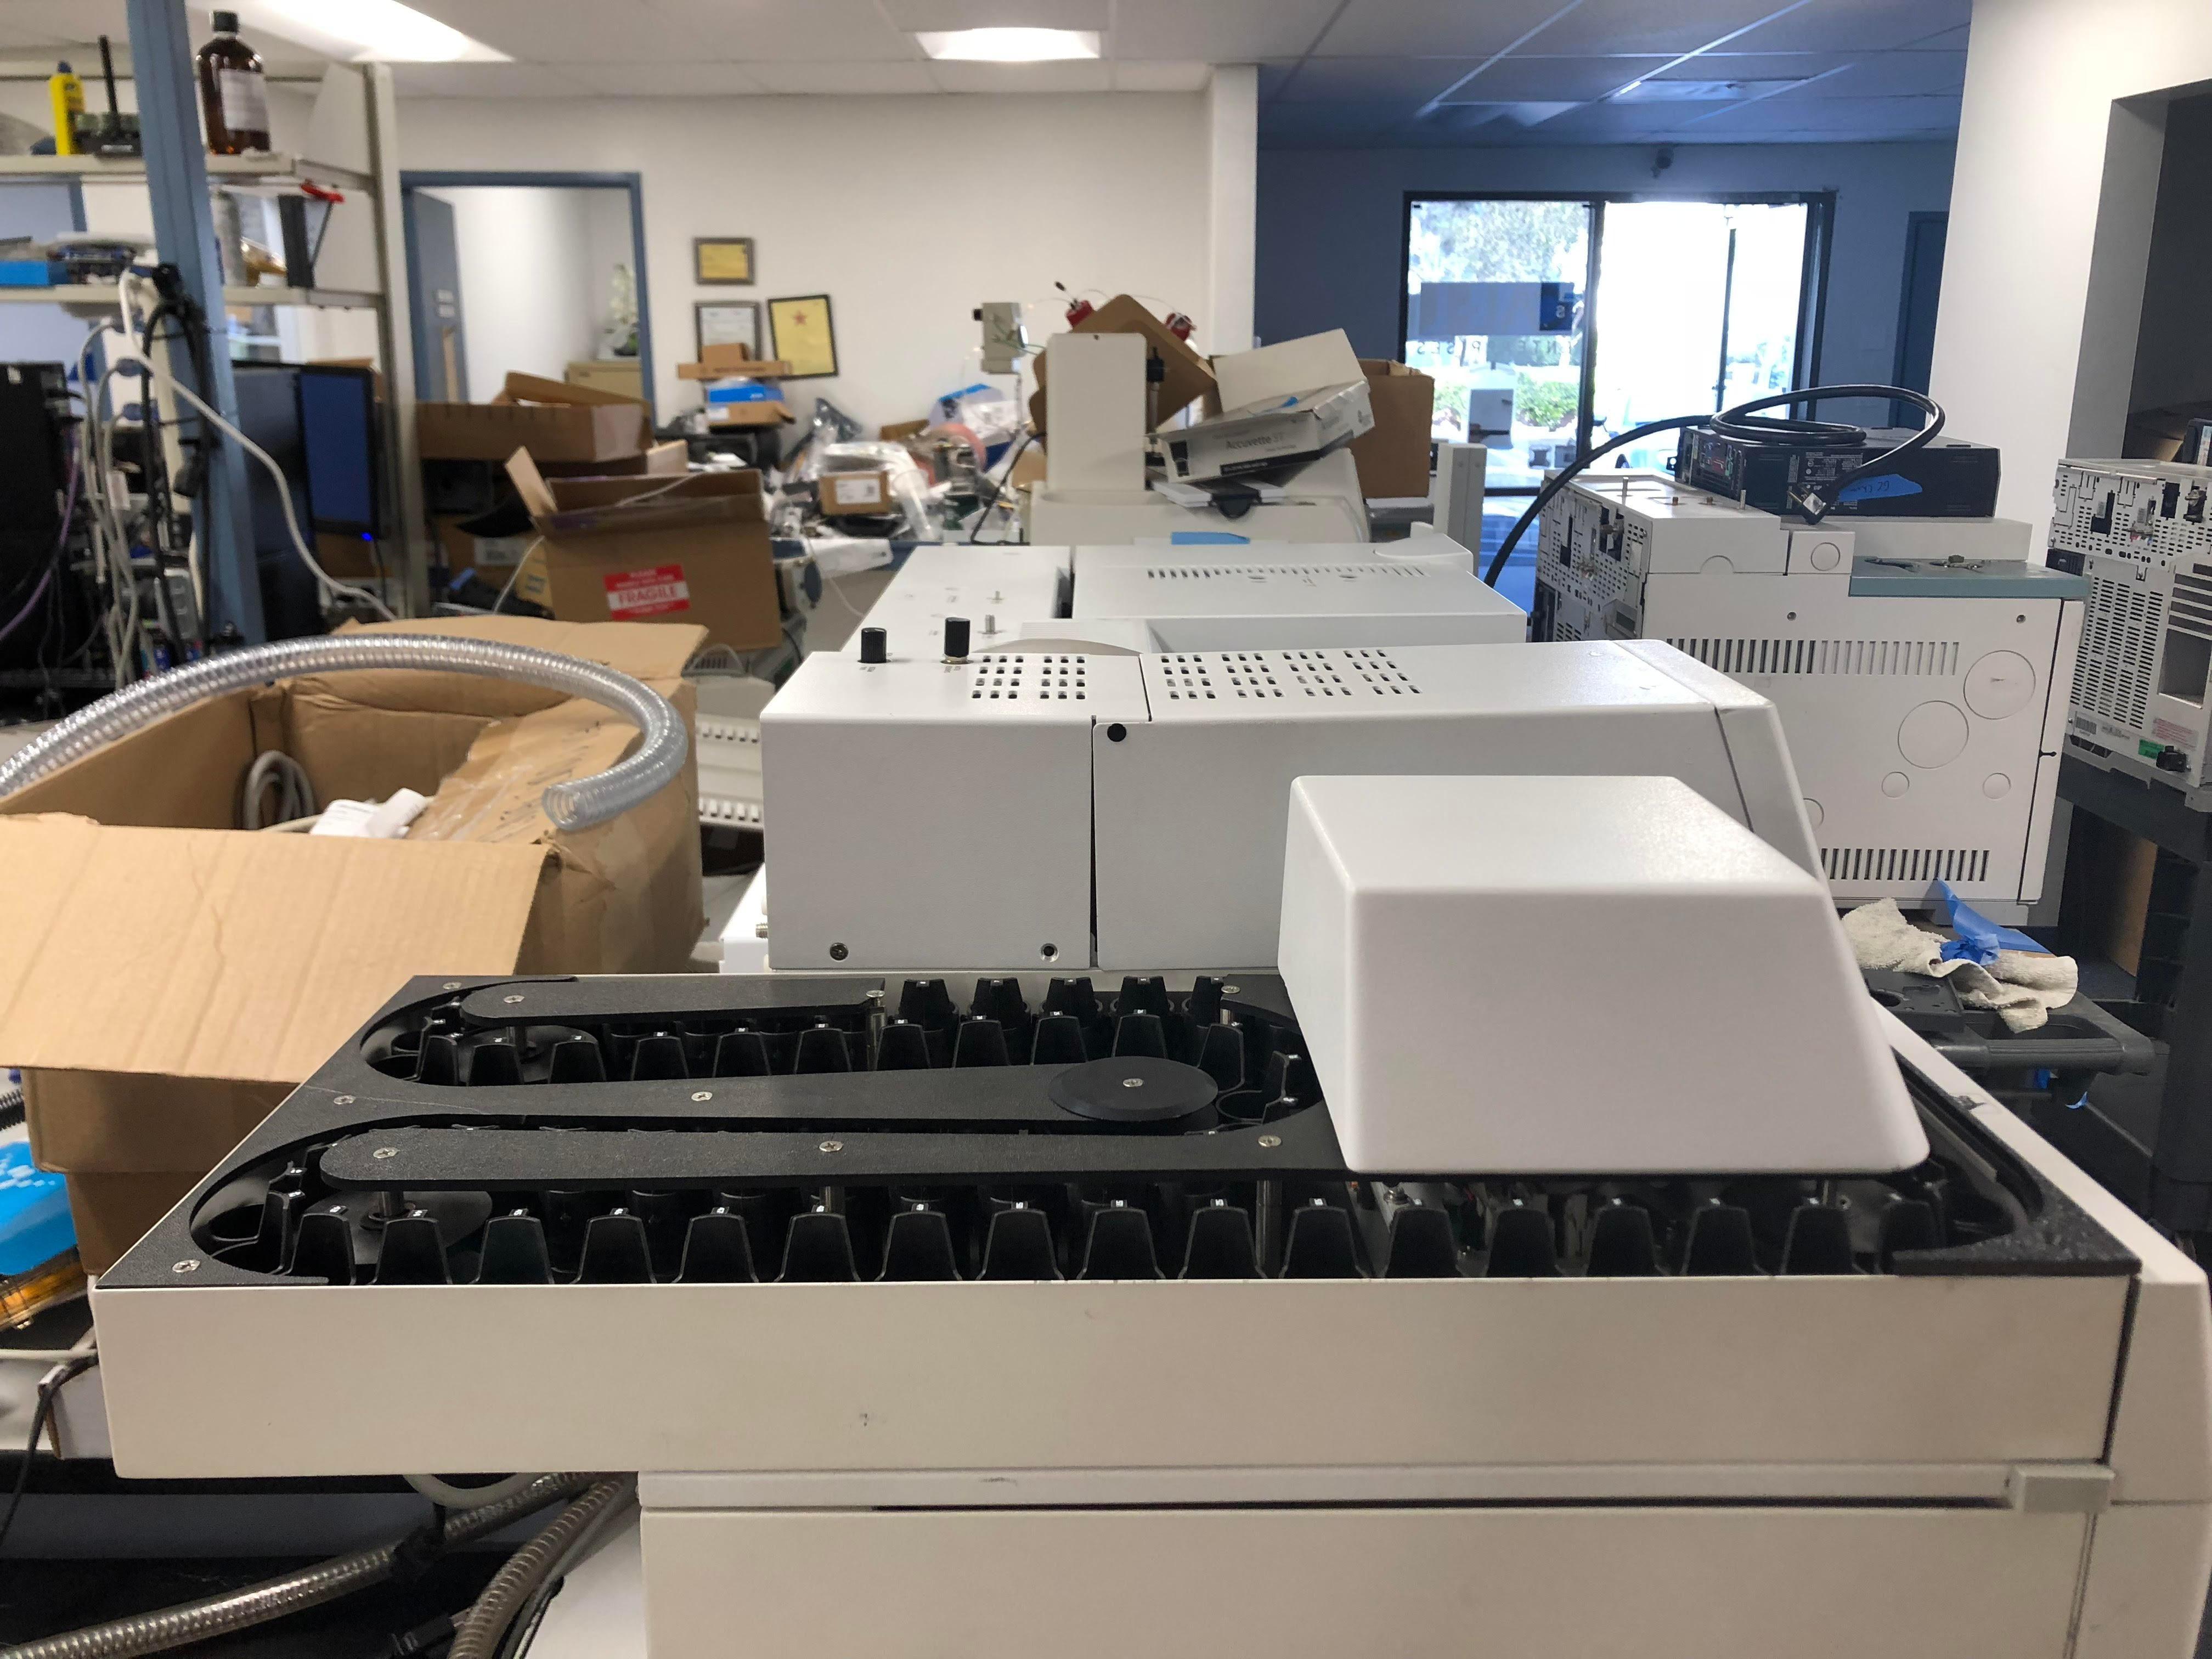 Agilent - 5975C inert XL MSD Triple Axis Detector -7890A GC System-G1888 N/H SAMPLER